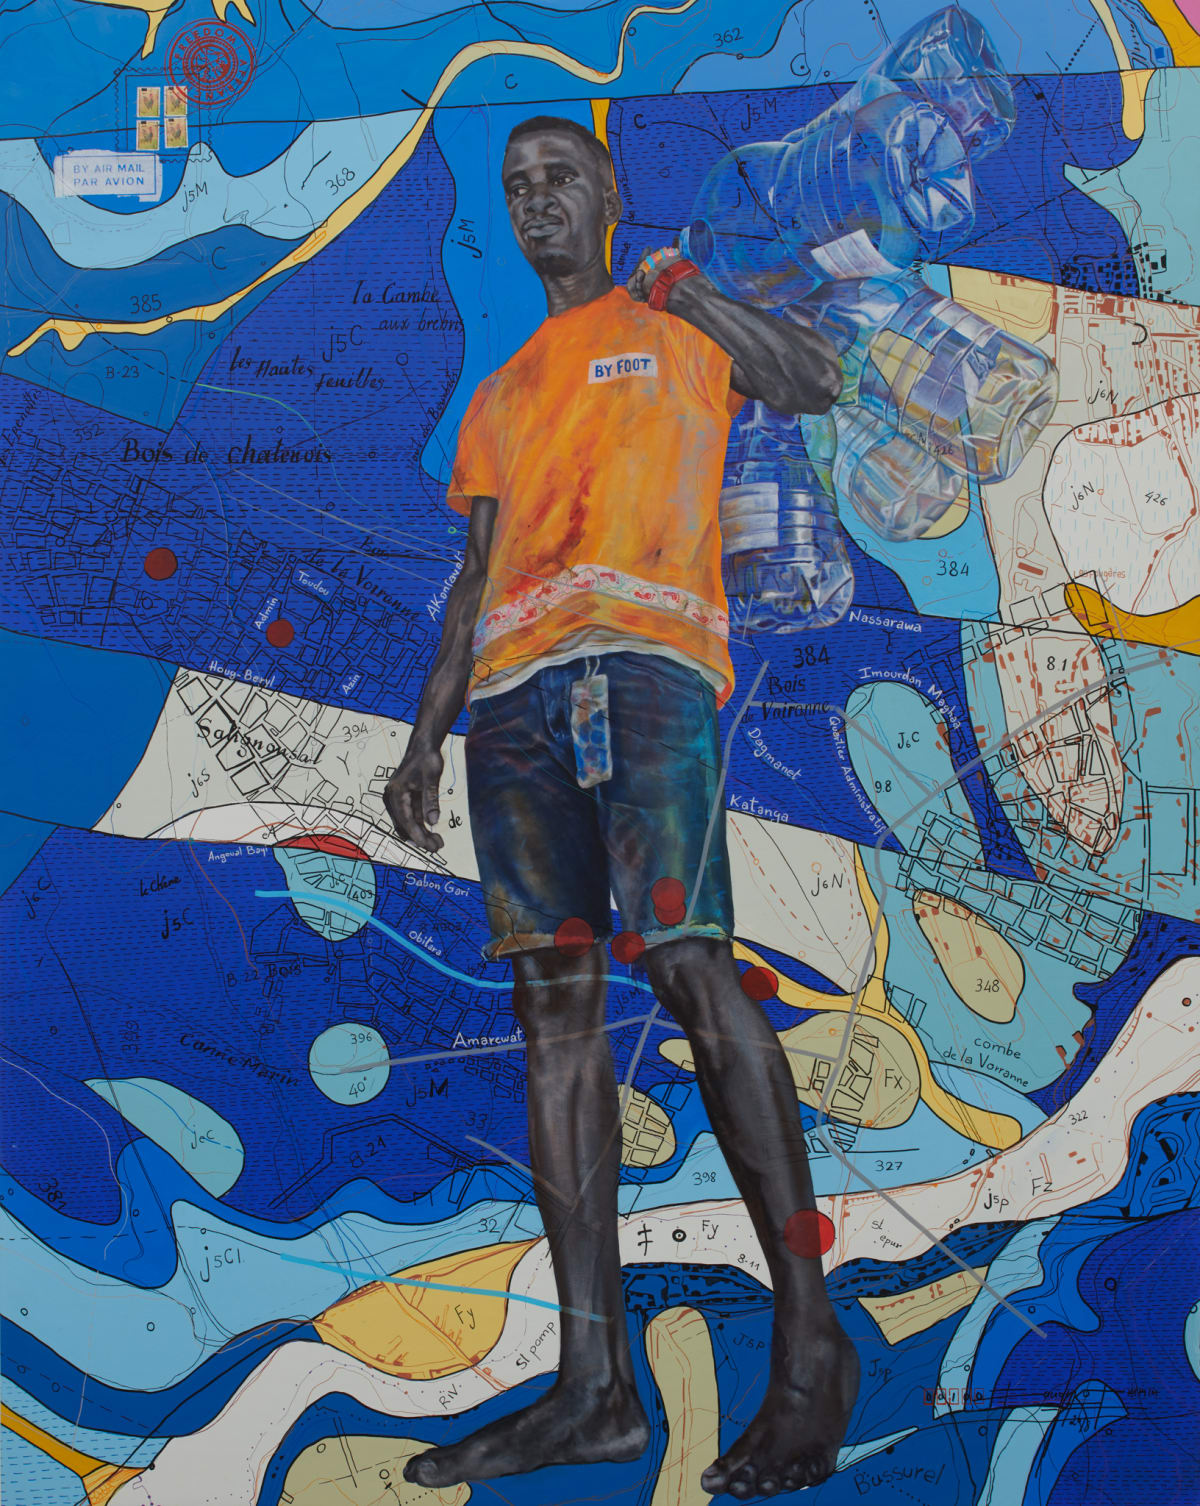 Jean David Nkot, PO. Box. Labyrinthe.com, 2018